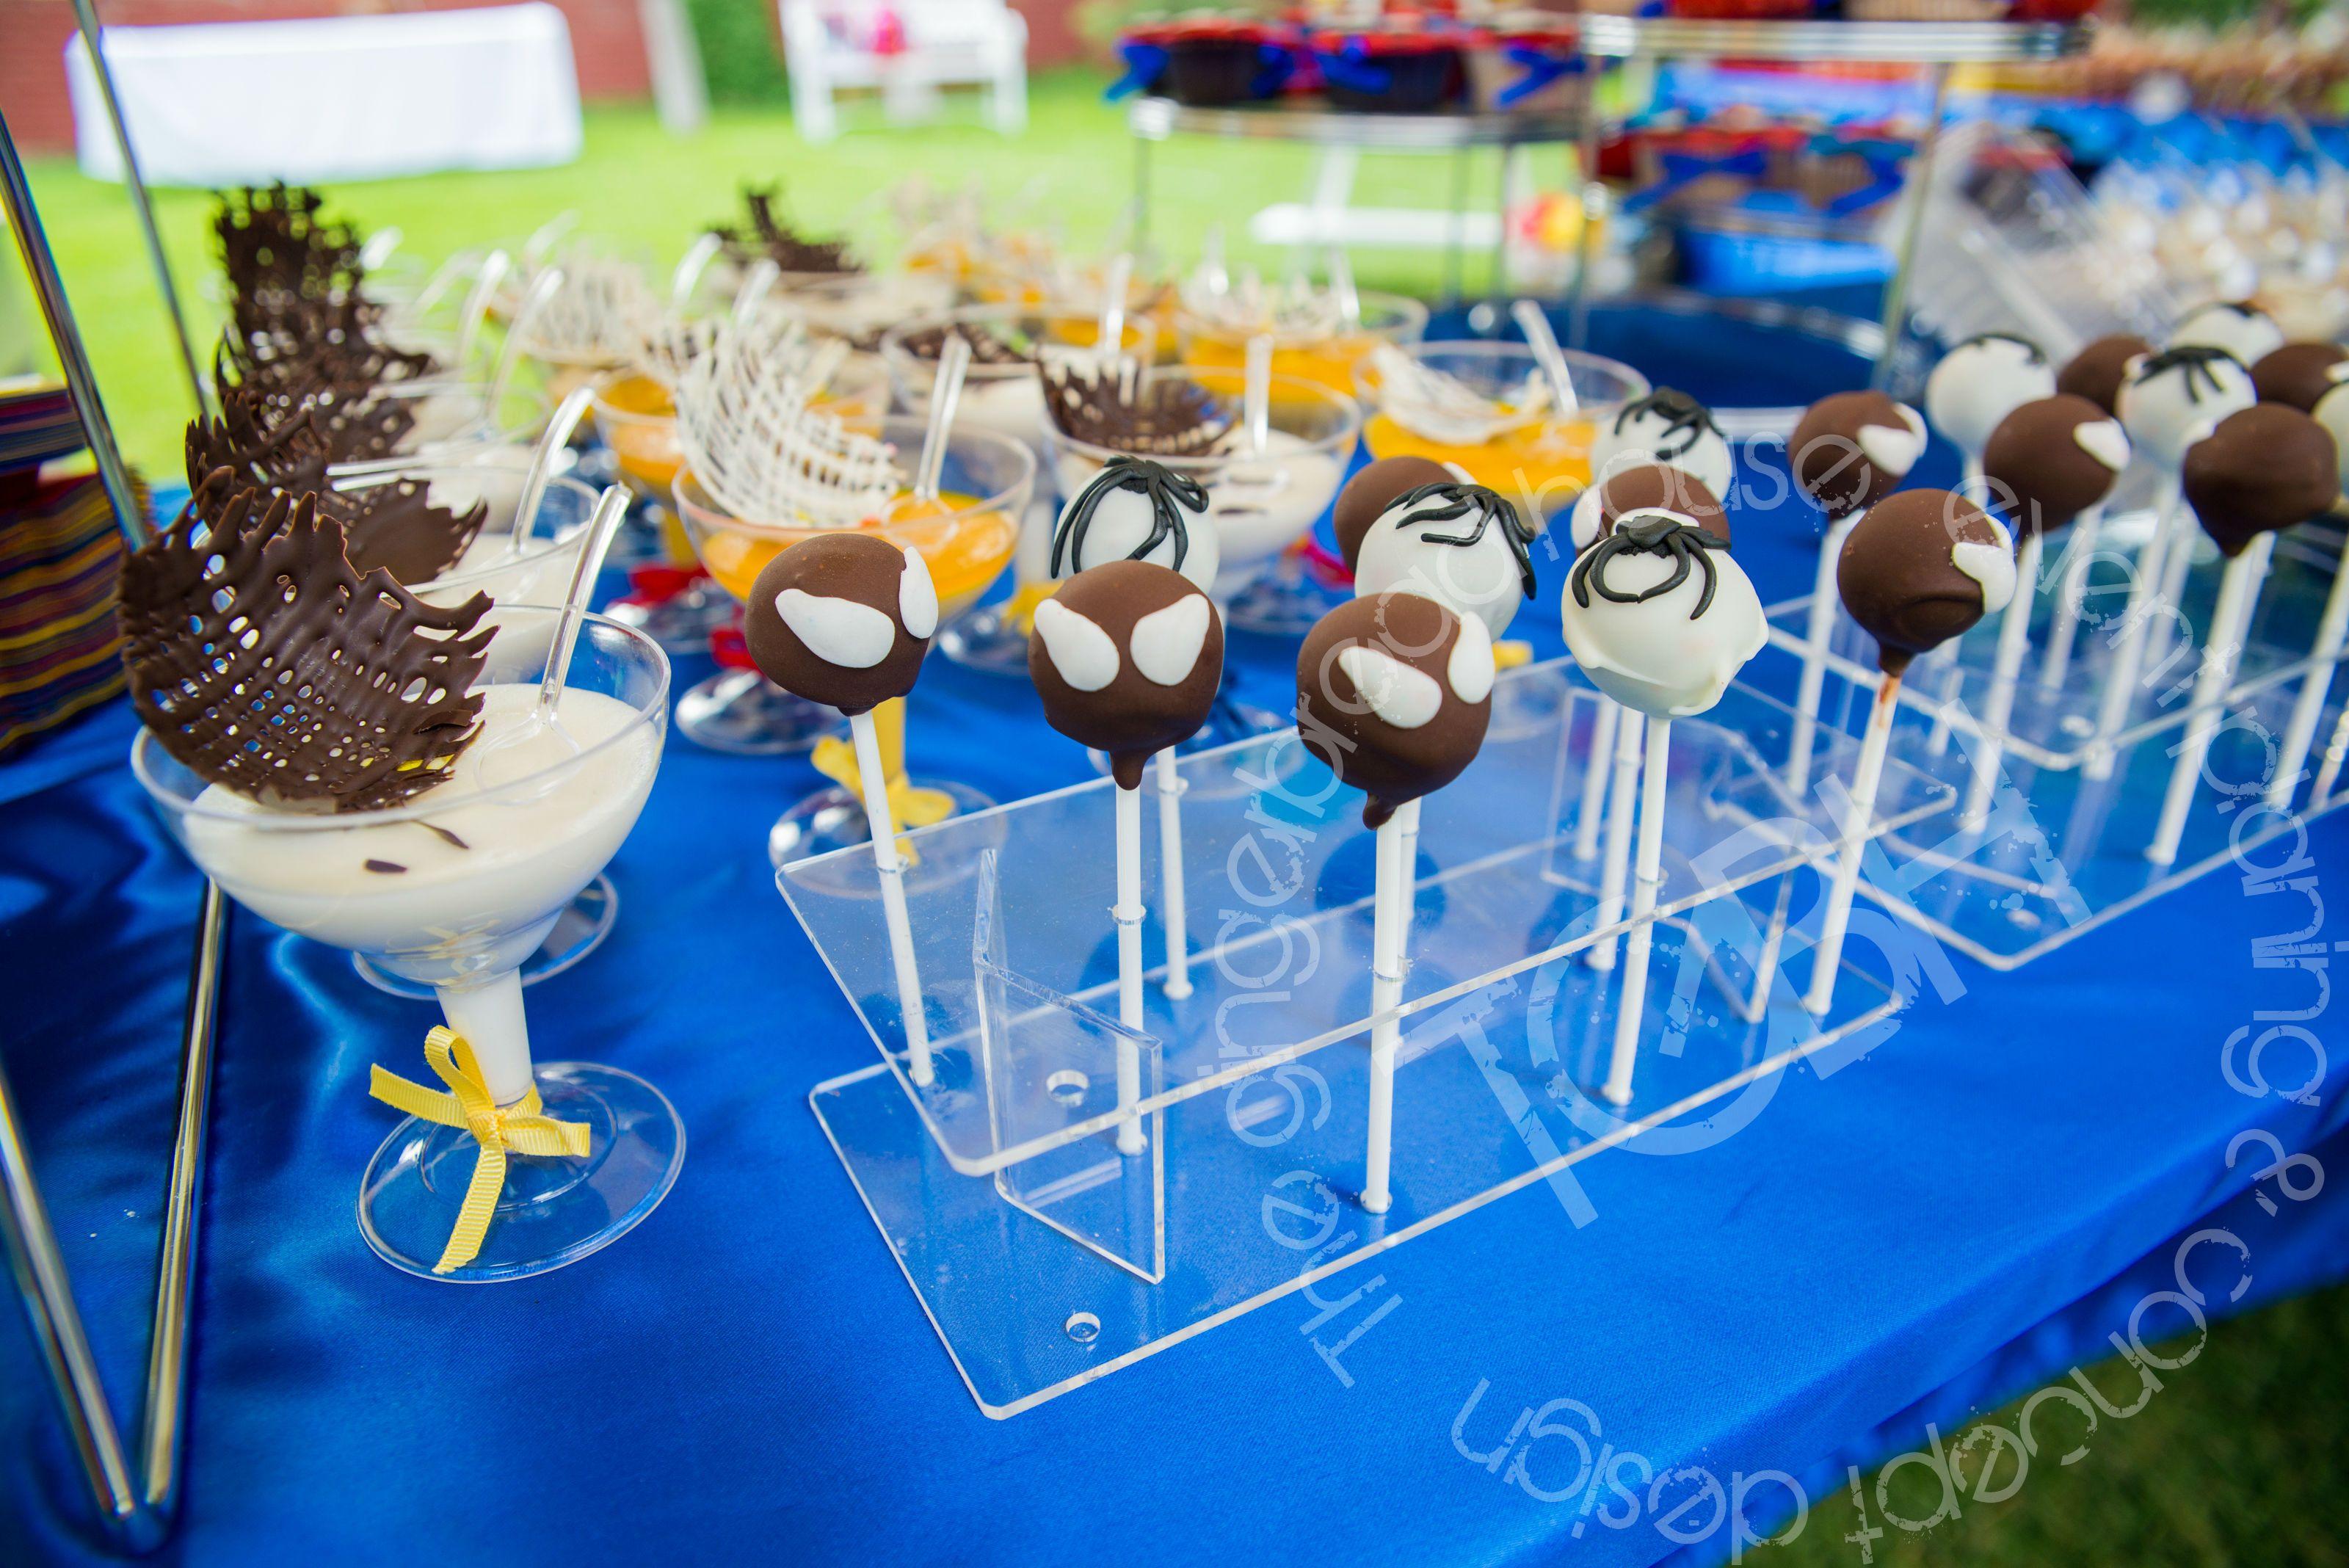 Spiderman Birthday Party Dessert Bar Cakepops